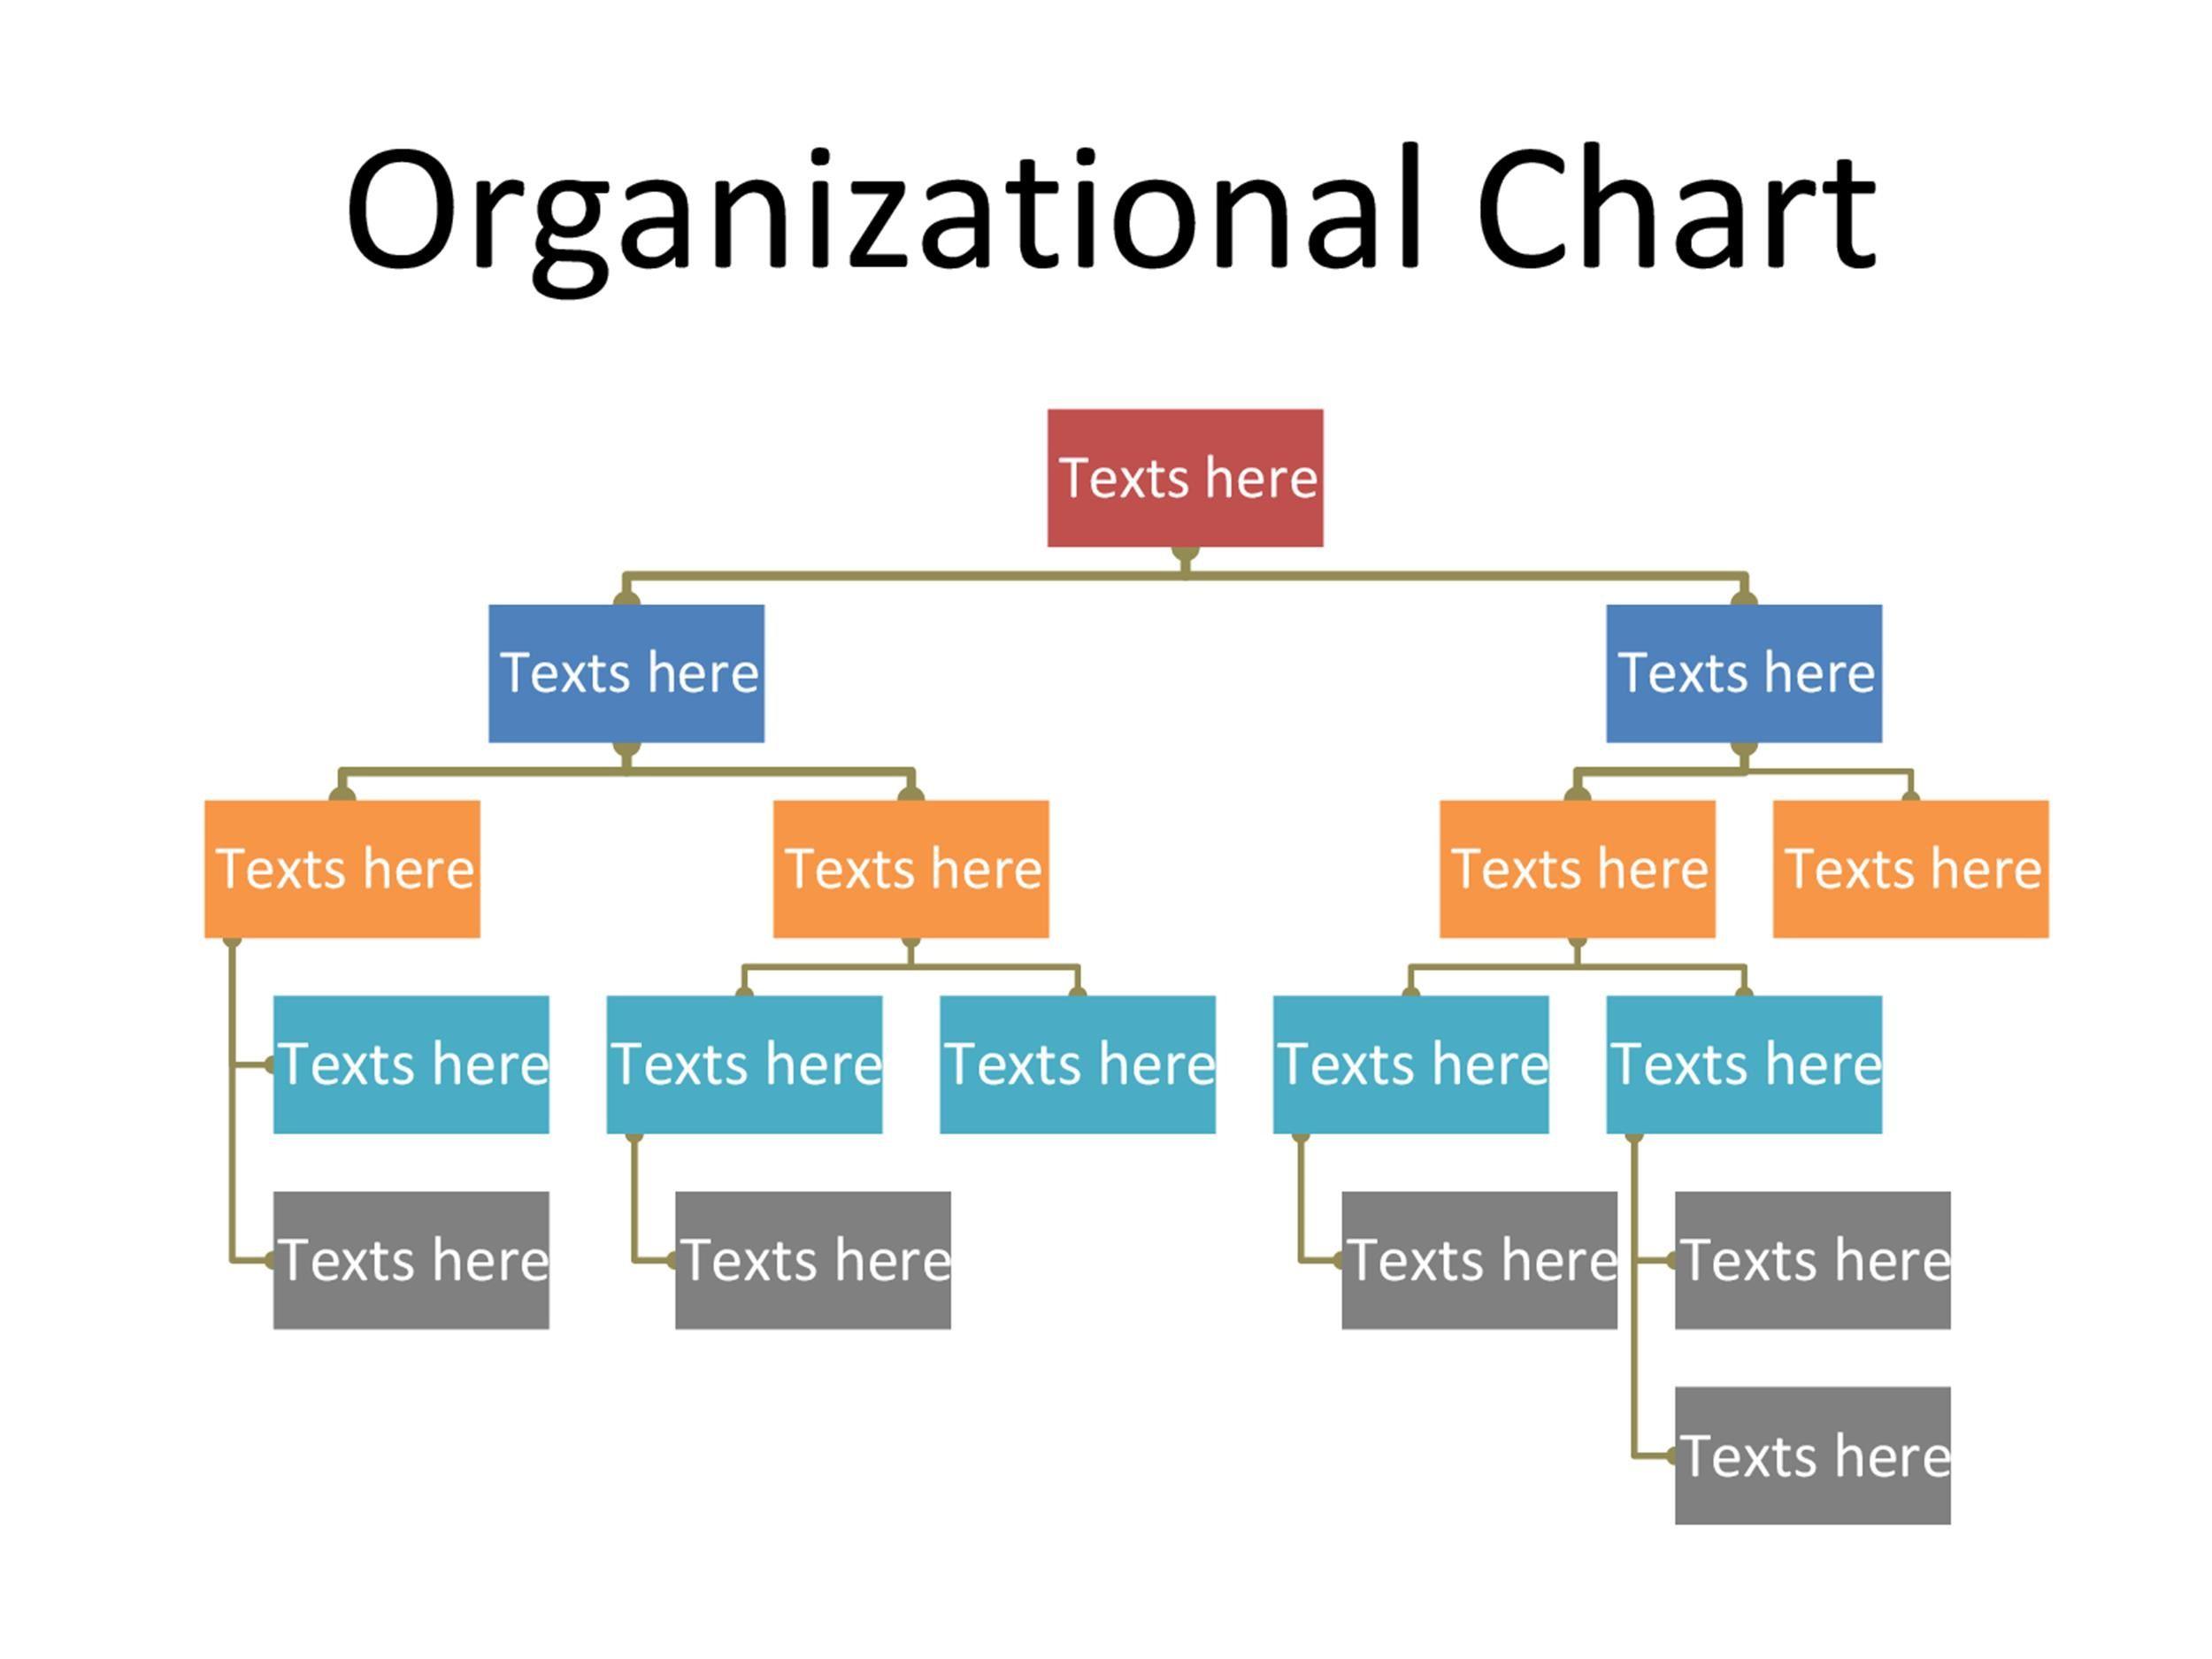 007 Incredible Word Organization Chart Template High Resolution  Free Organizational 2007 2013 OrgFull